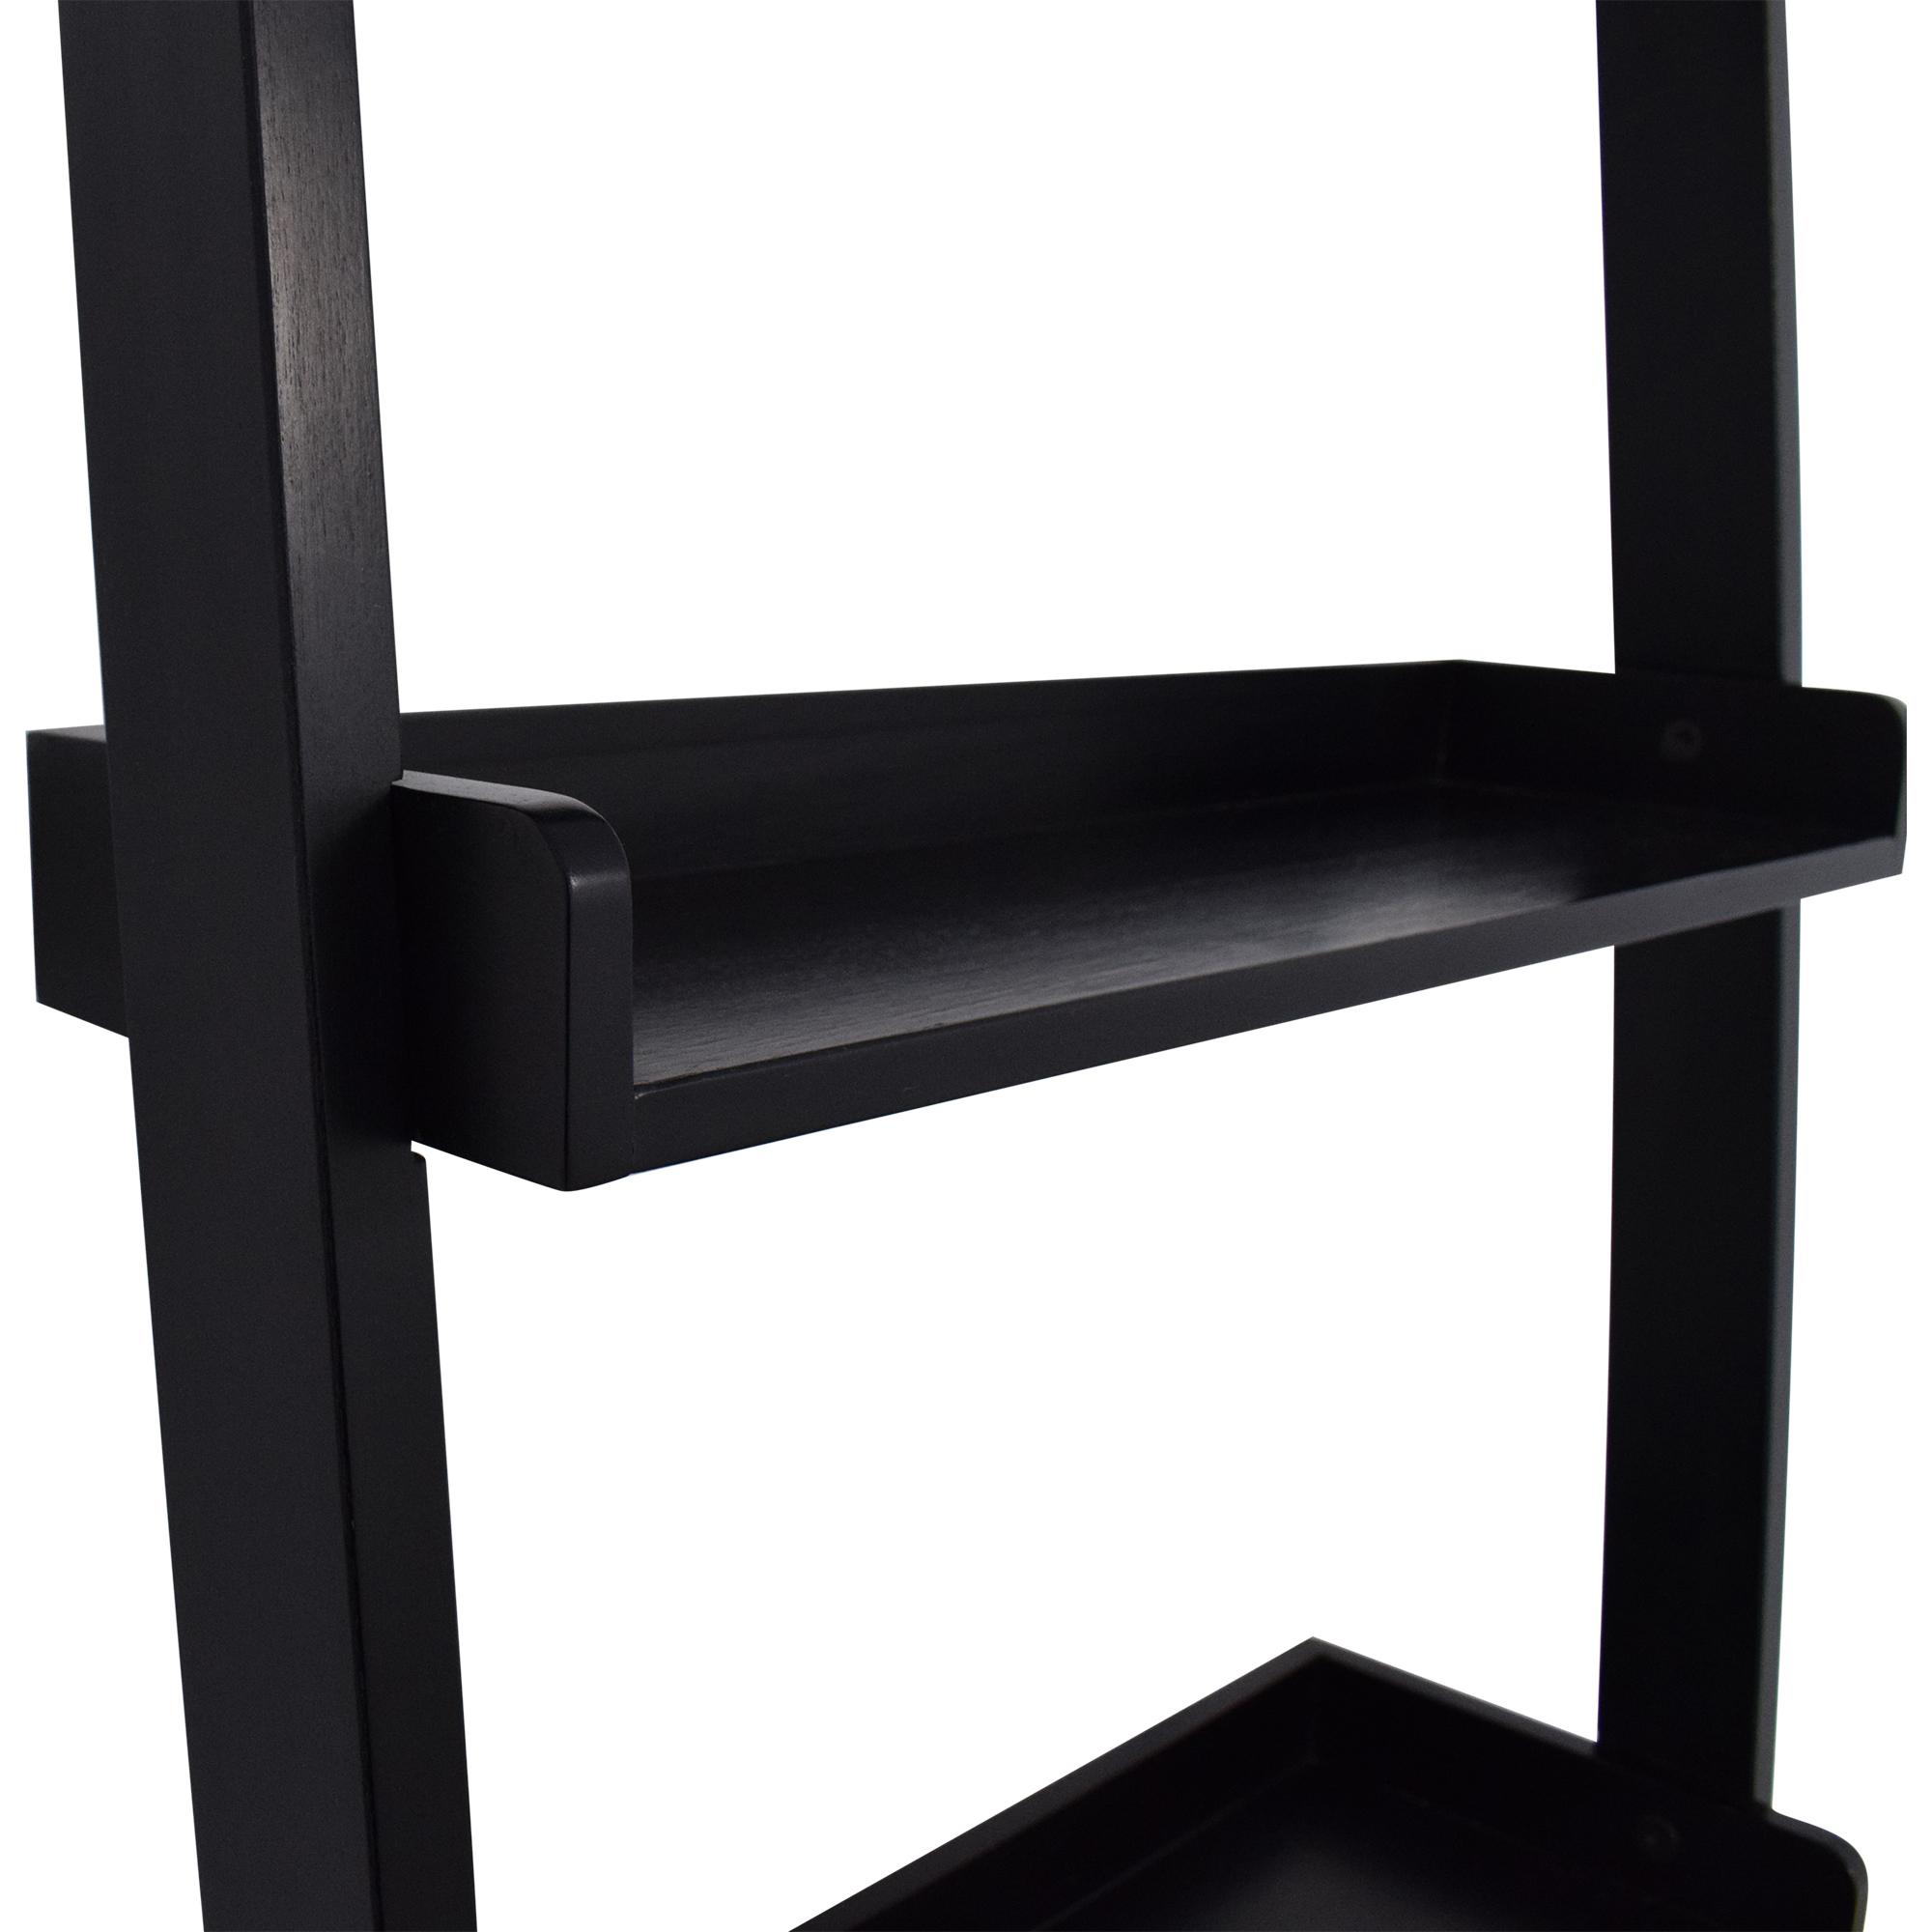 Crate & Barrel Crate & Barrel Ladder Bookcase used